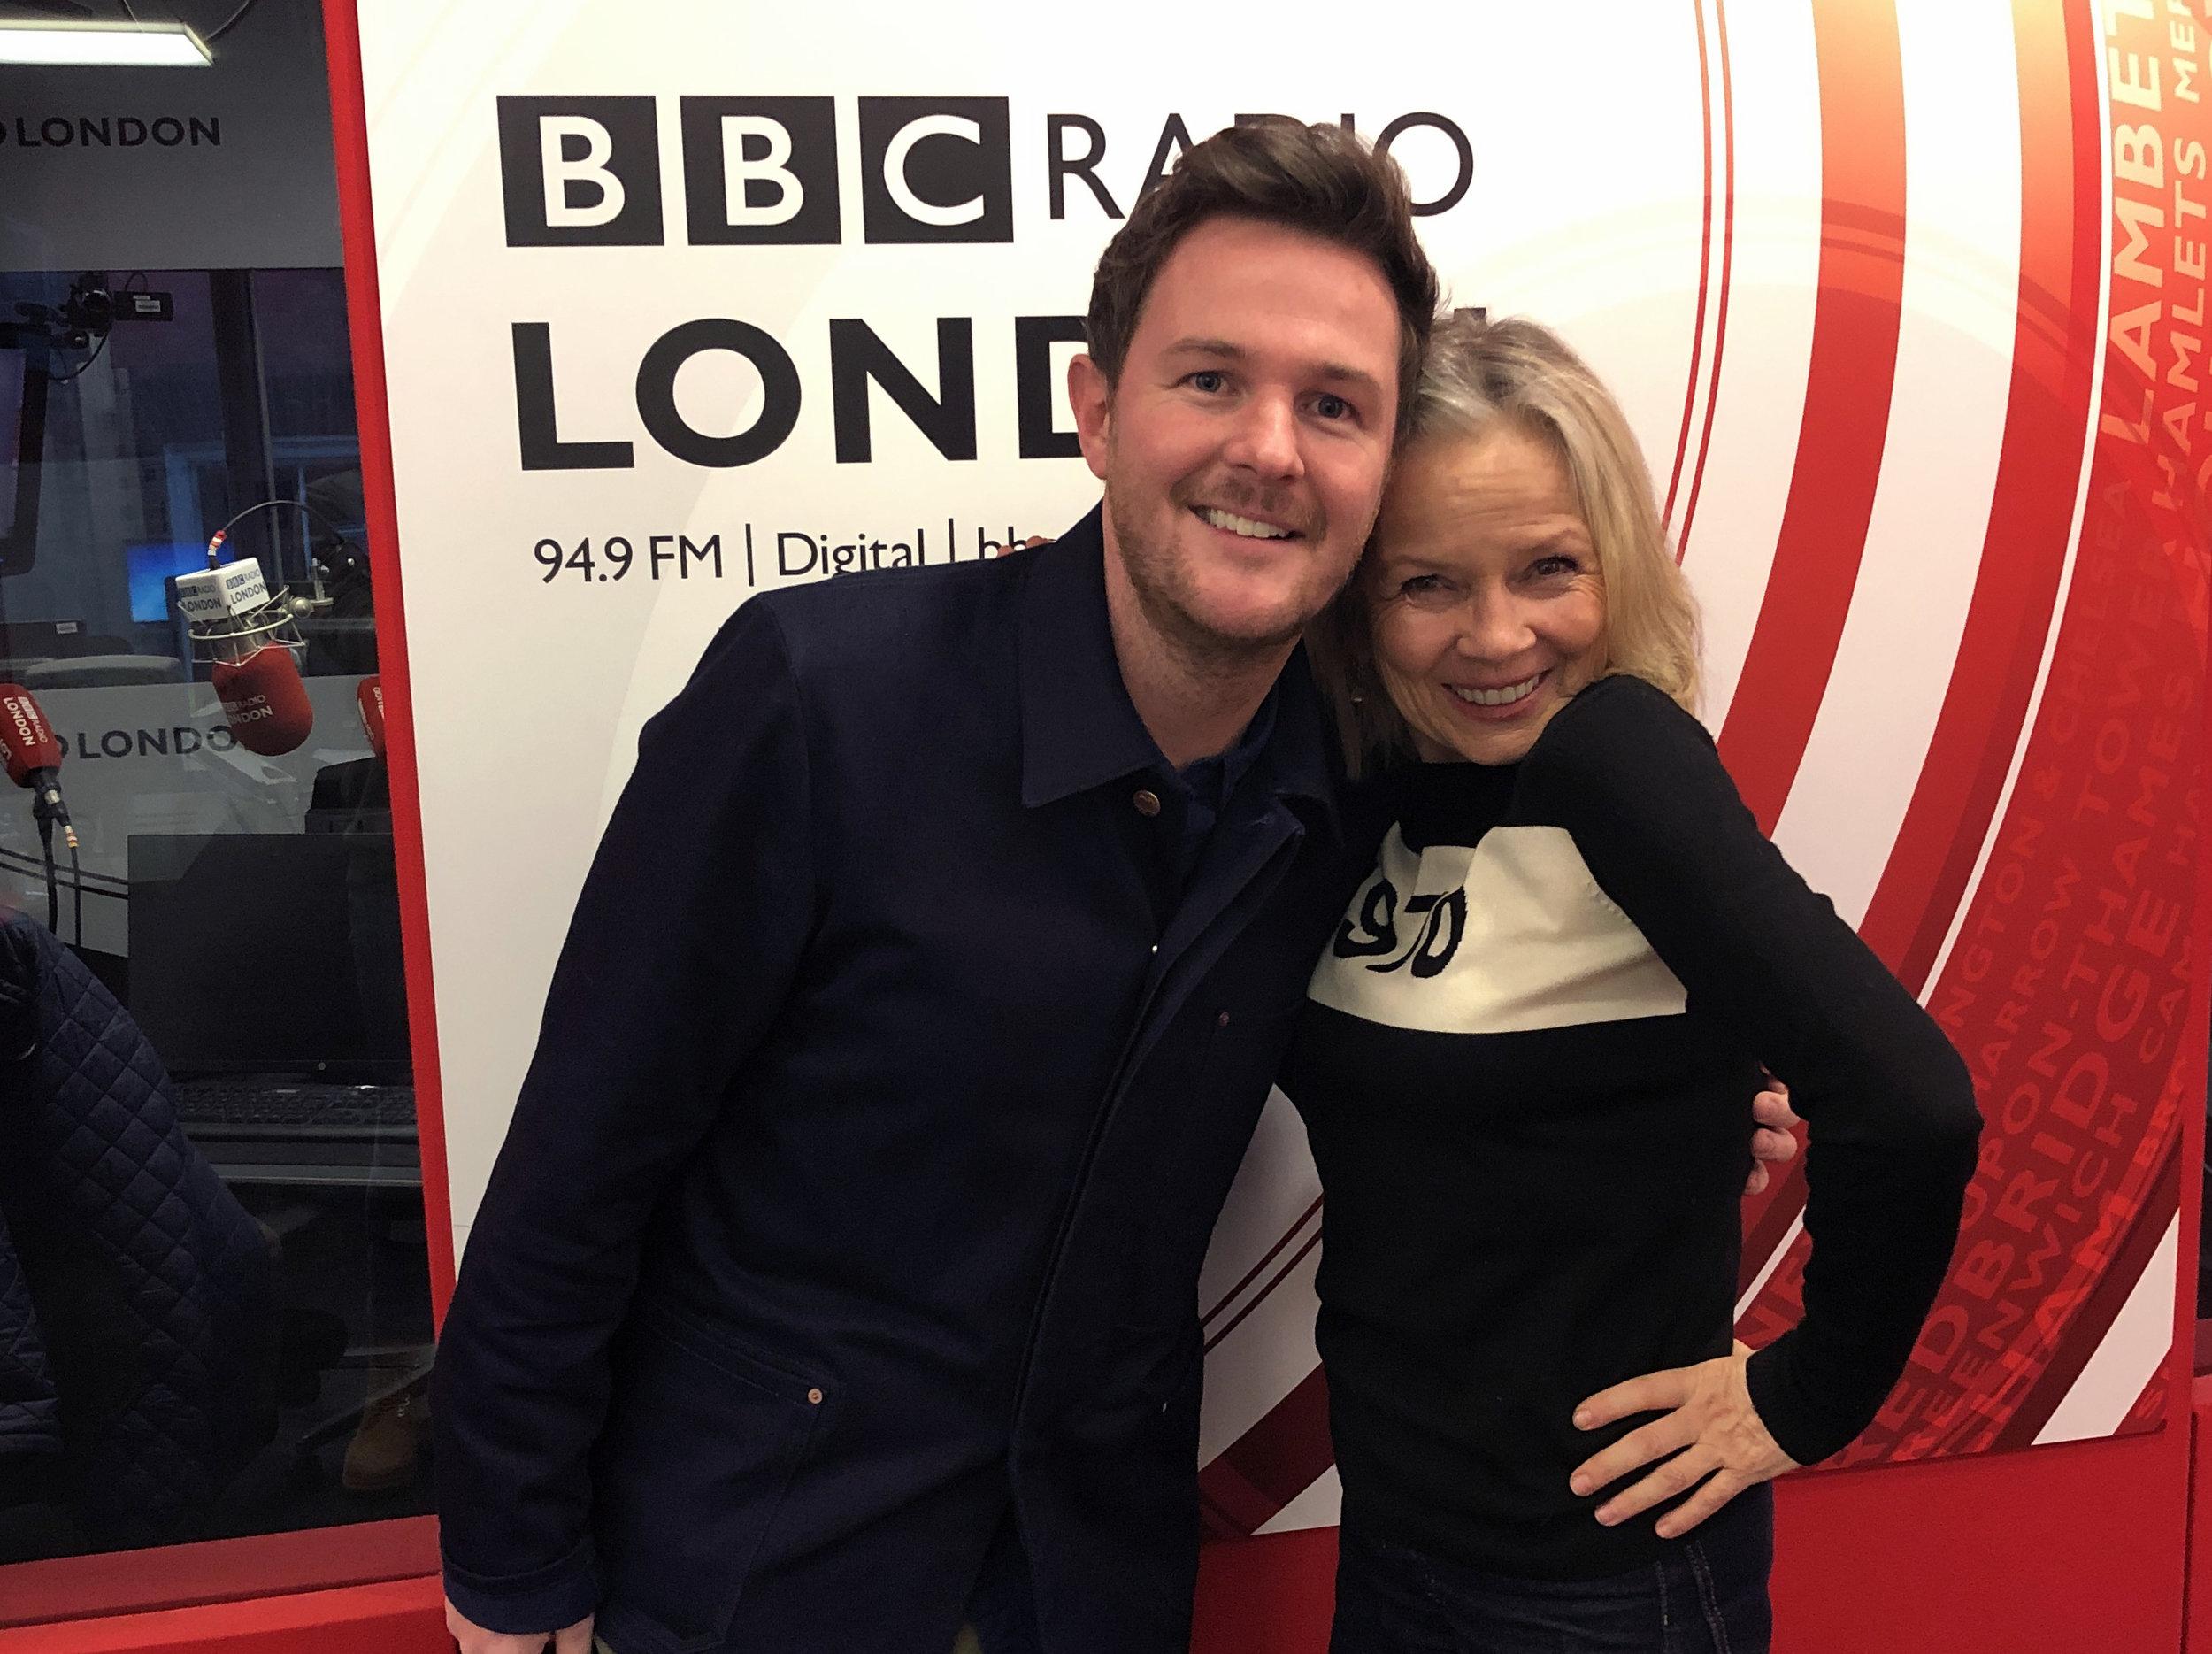 BBC LONDON Jo Good